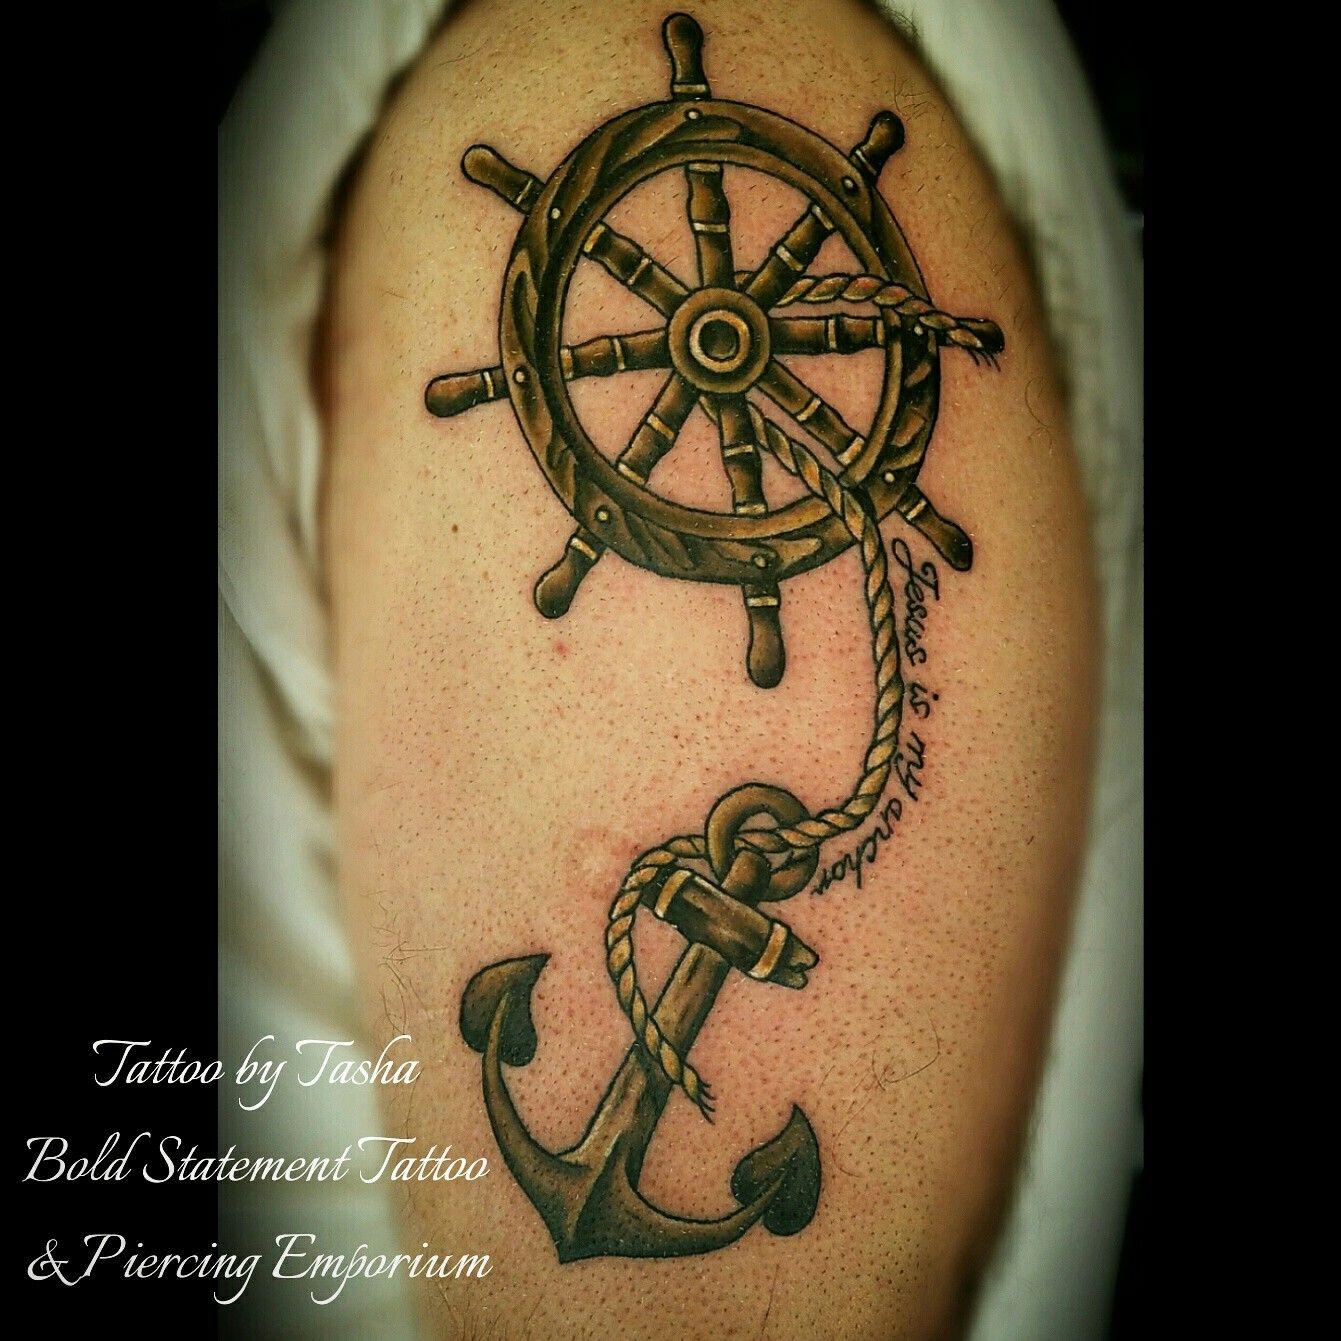 Wooden Anchor And Ship S Wheel Tattoo Ship Wheel Tattoo Tattoos Wheel Tattoo